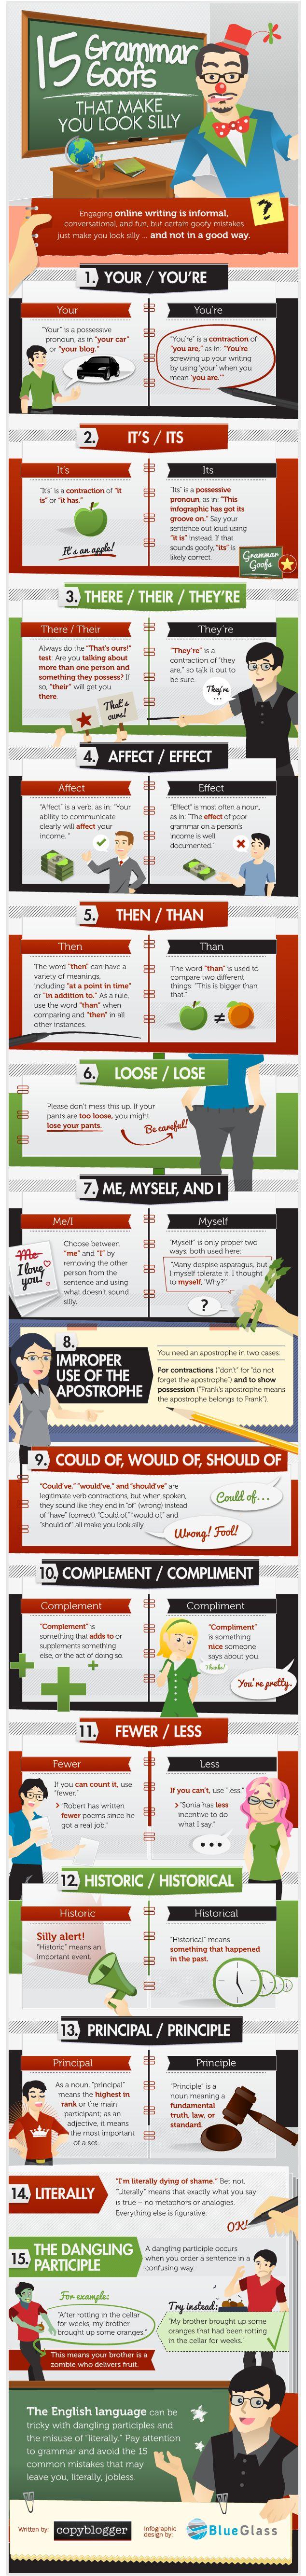 #hr #recruitment: Top 15 Grammar Mistakes That Candidates Make (Infographic)